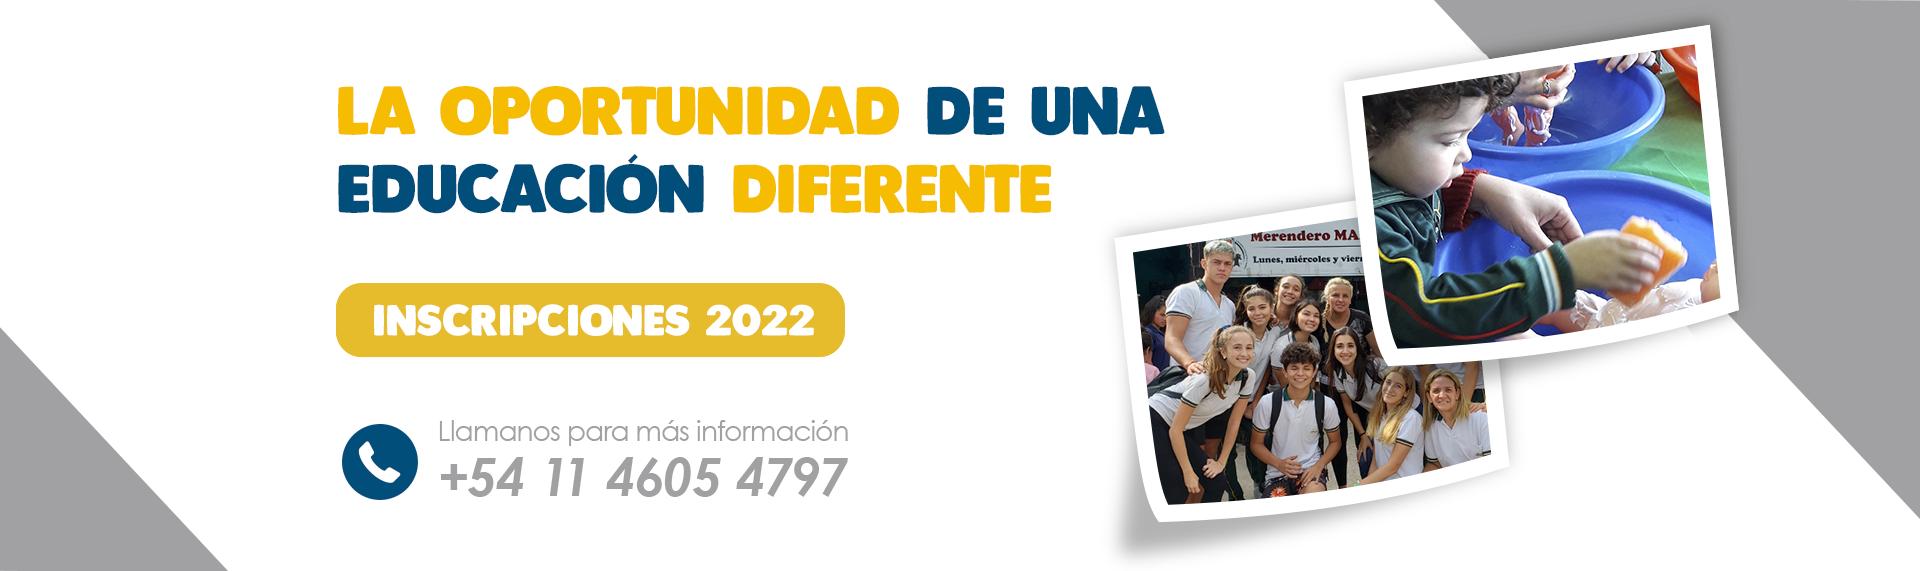 03-Destacado-INSCRIPCIONES-new.png